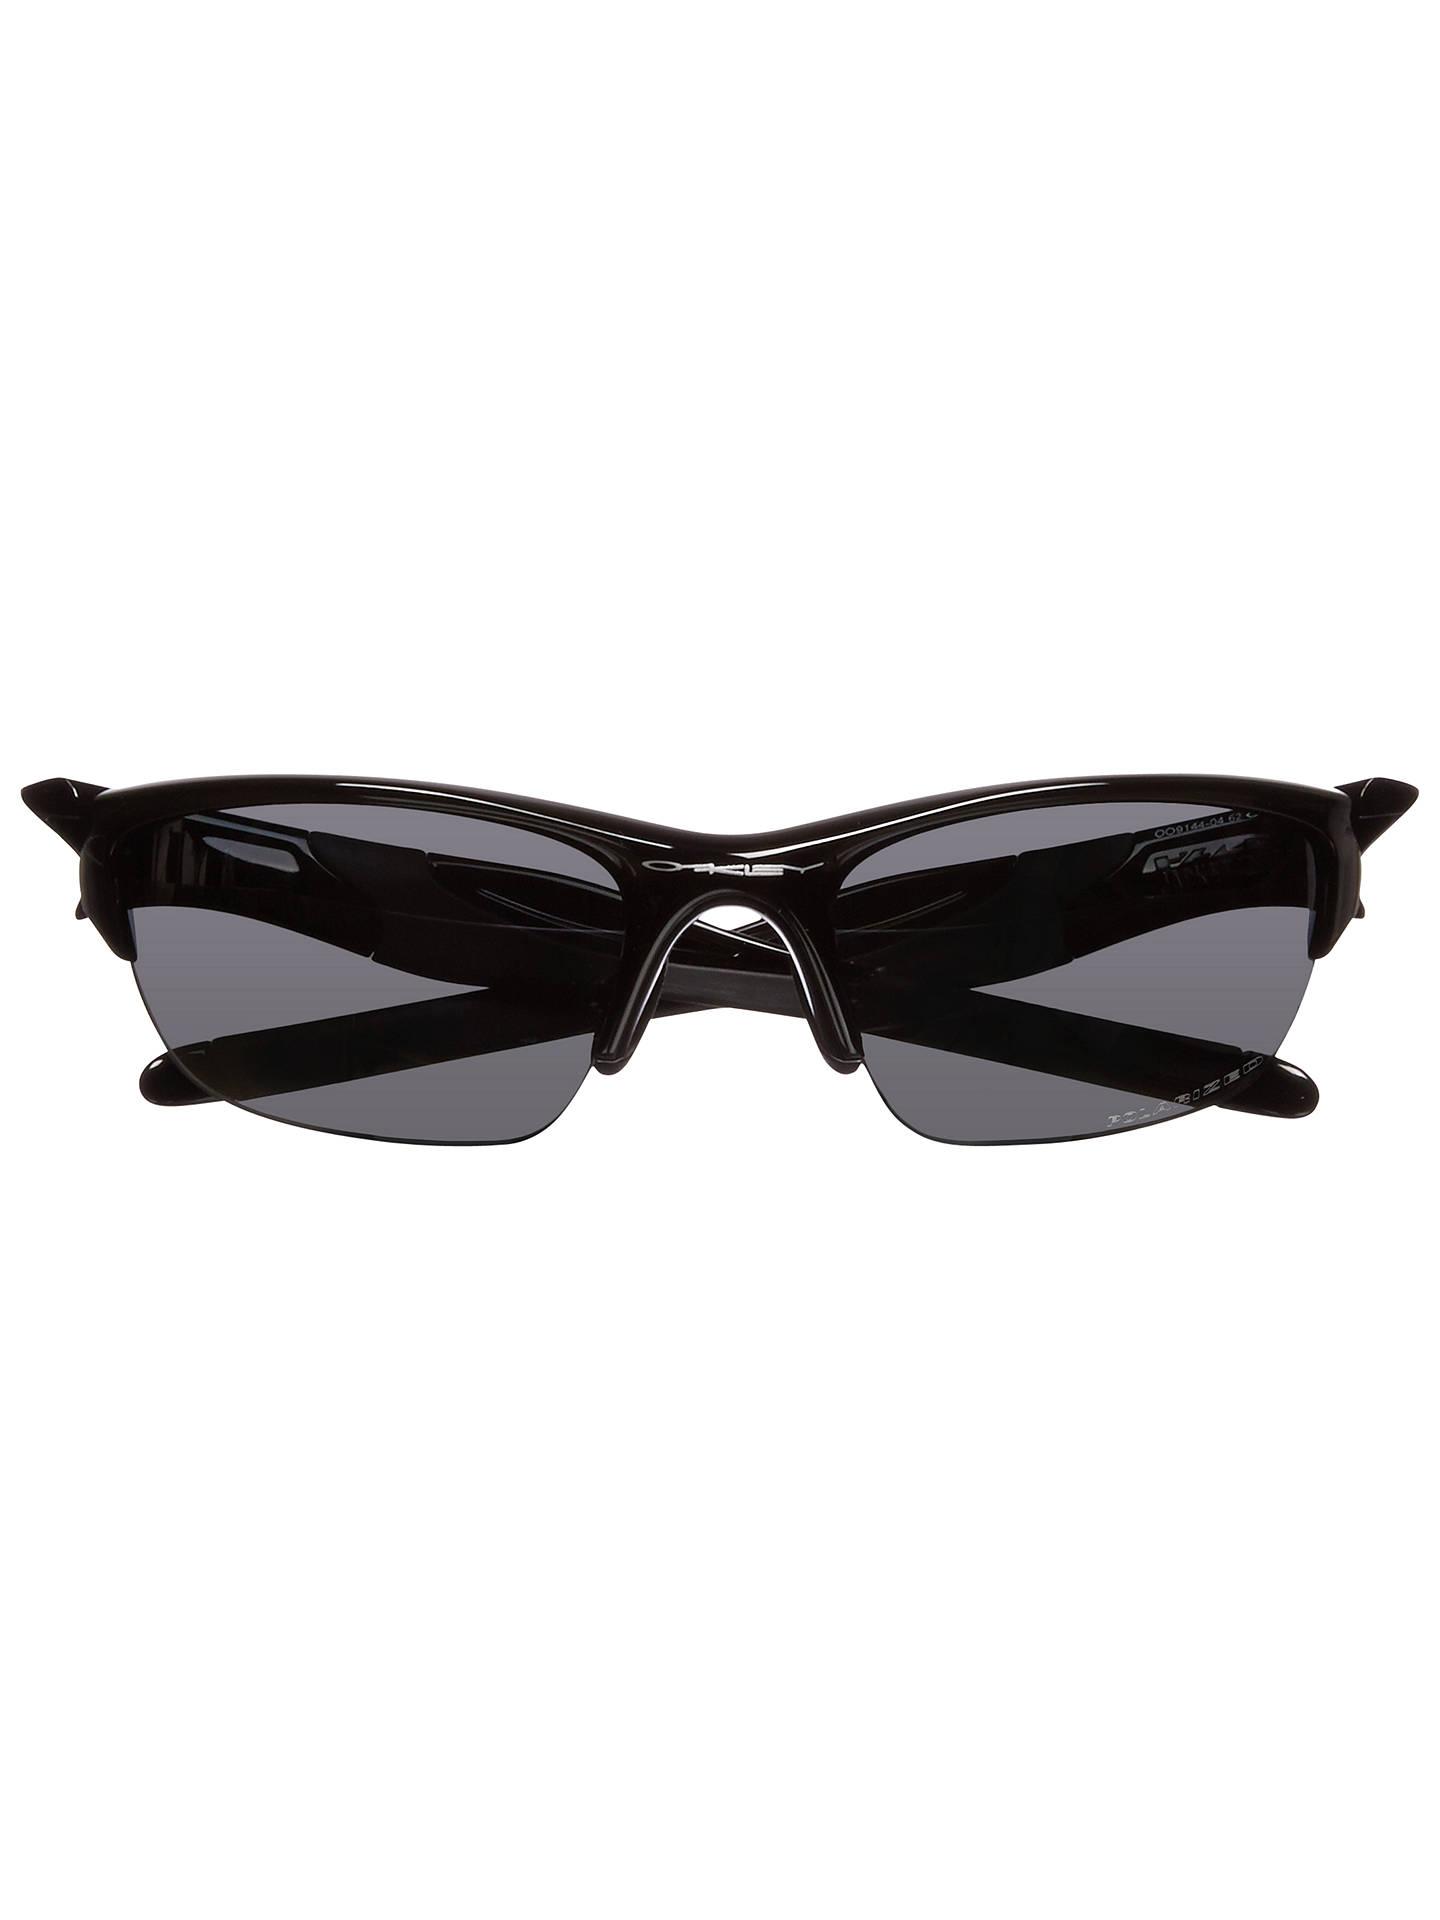 755c50a4460 Oakley OO9144 Half Jacket 2.0 Rectangular Polarised Sunglasses at ...